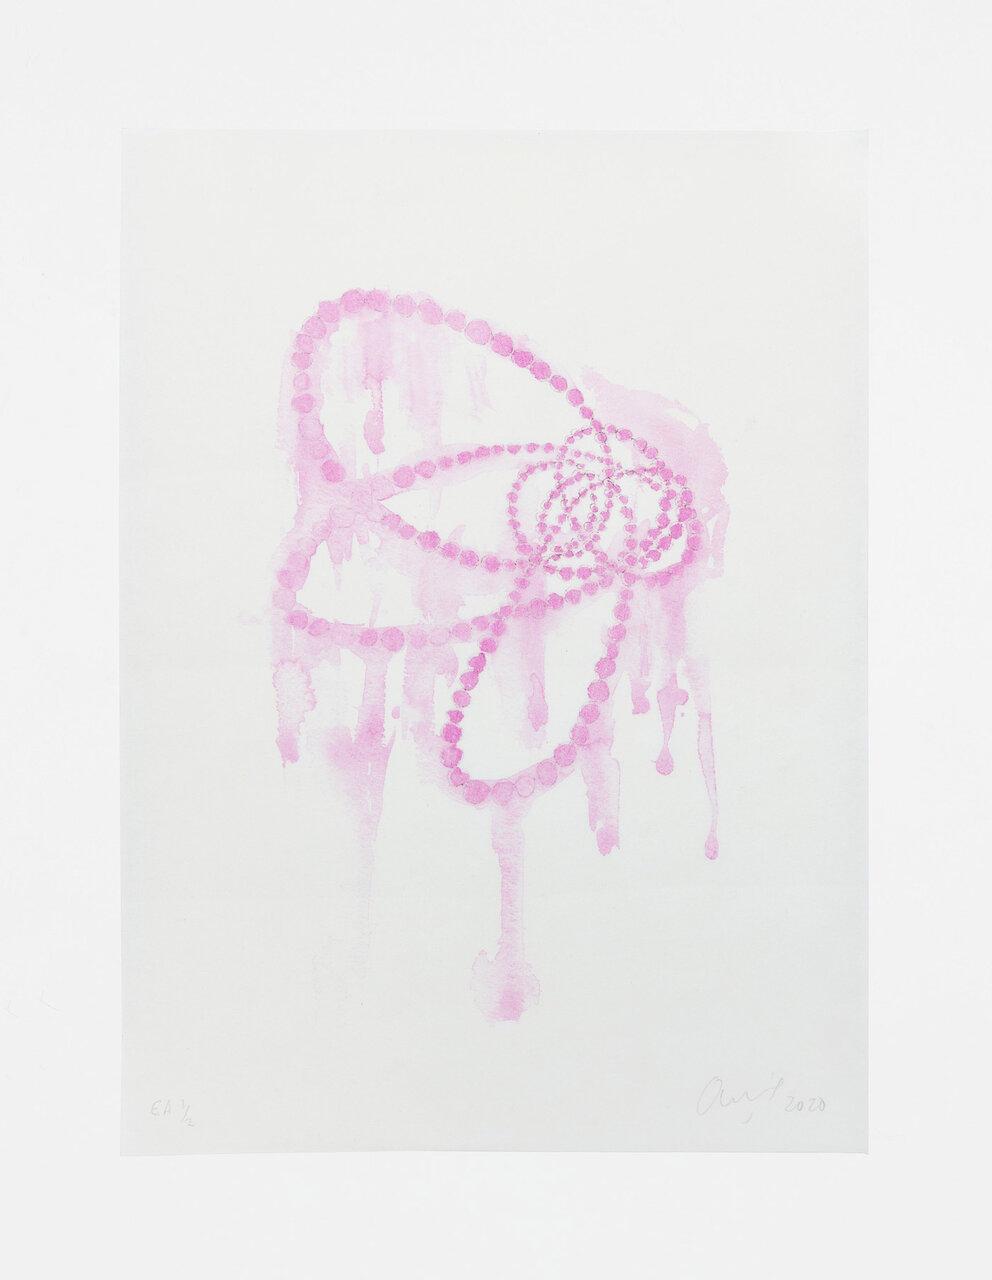 Jean-Michel OTHONIEL Kiku - Kakitsubatairo (Rabbit-ear iris color), 2020, Monotype on Japanese paper, 36 x 24 cm, 1/1 edition + 2 AP © Jean-Michel Othoniel / JASPAR, Tokyo 2020 Photo: Claire Dorn / Courtesy of the artist and Perrotin